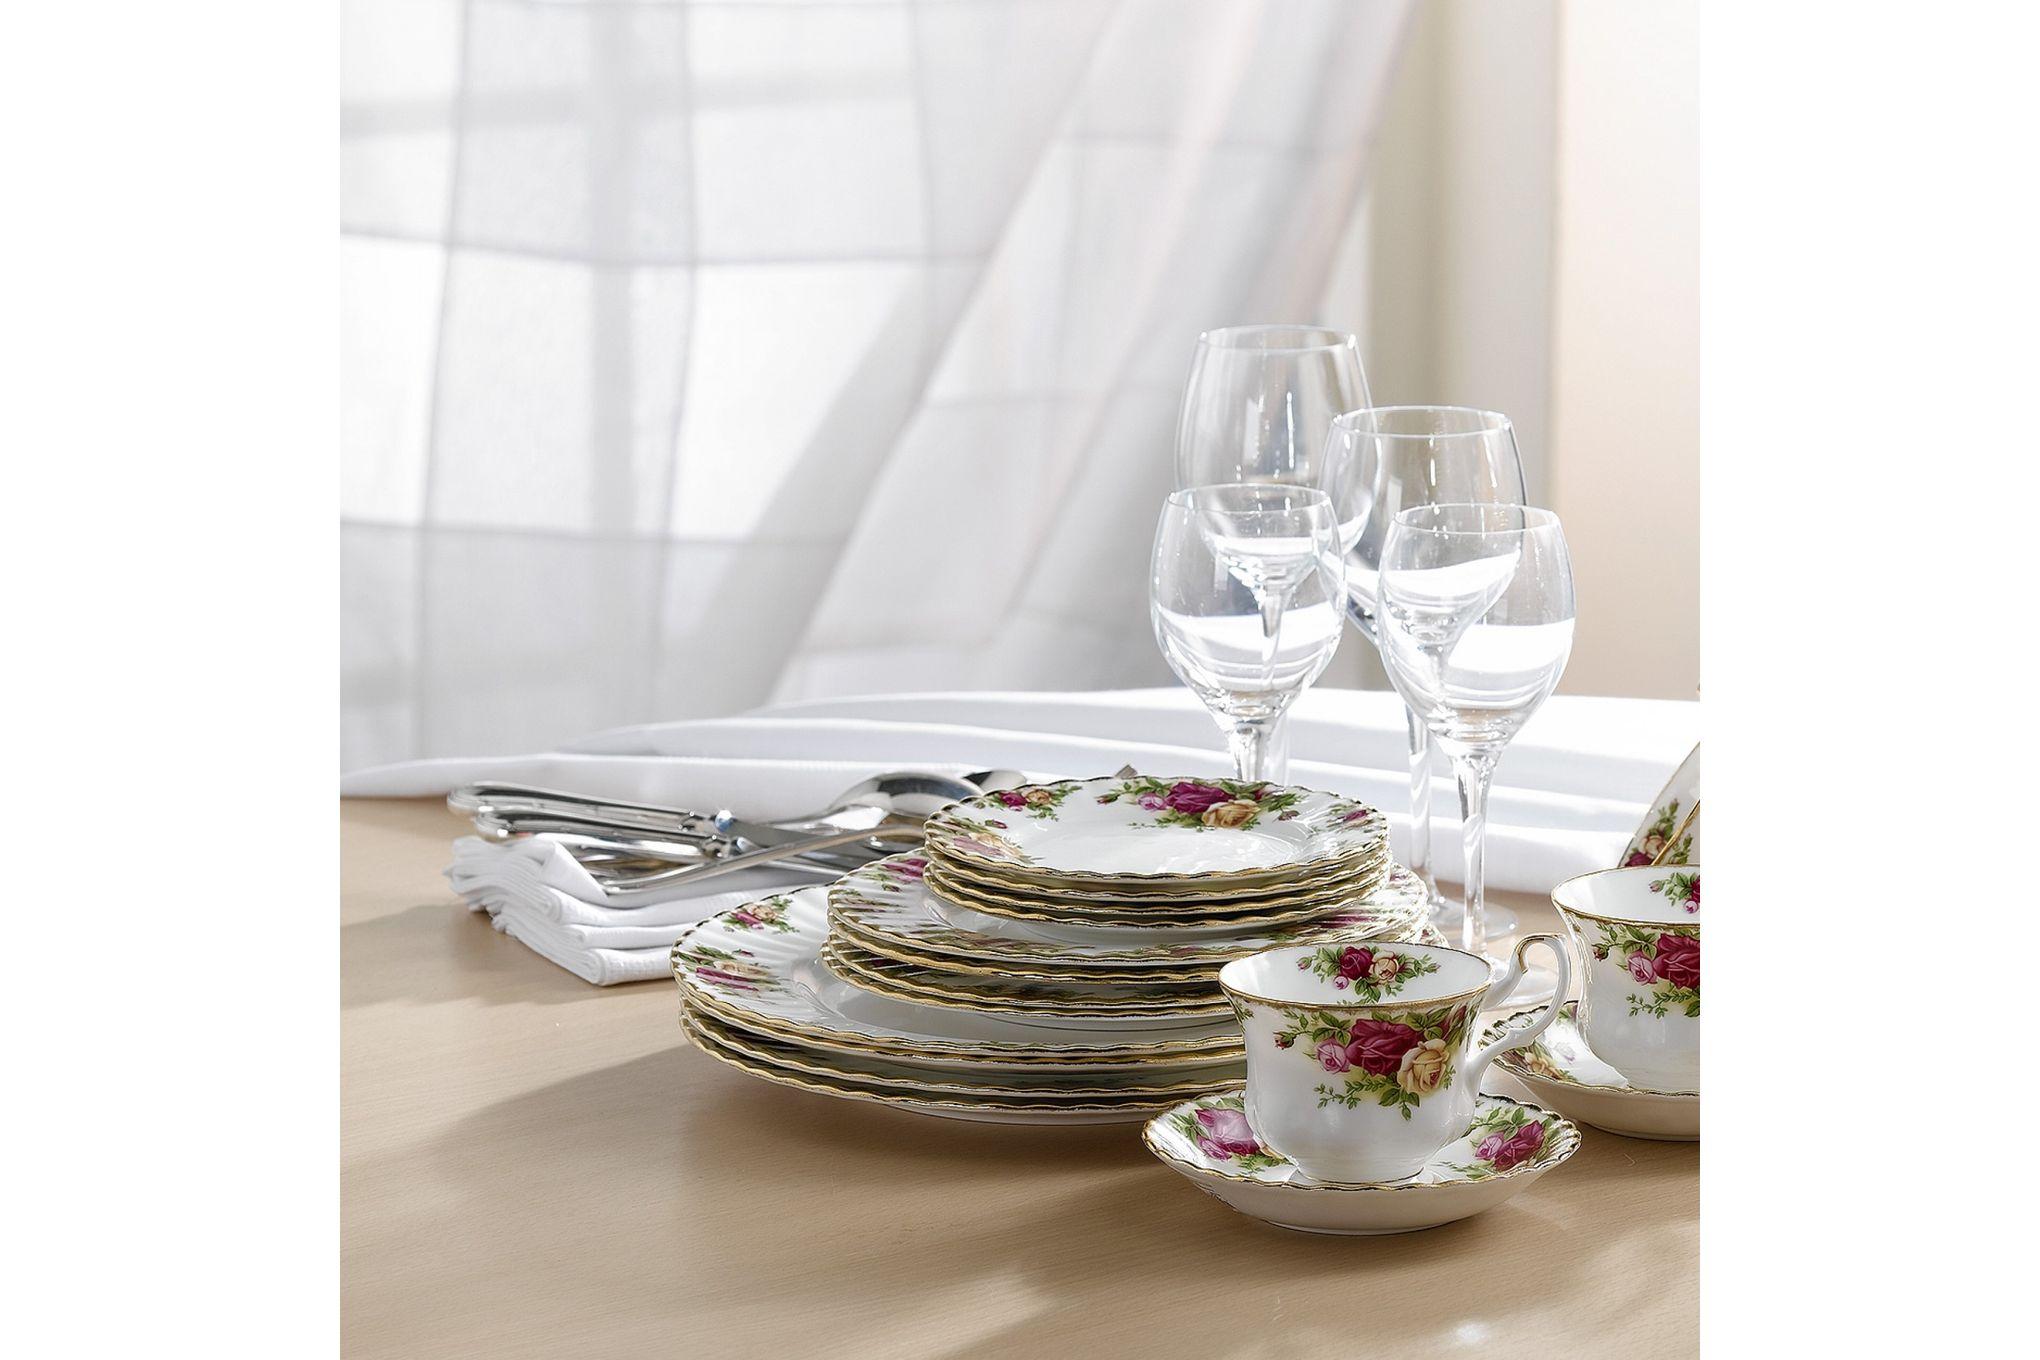 Royal Albert Old Country Roses - Made Abroad 20 Piece Set 4x Plate 27cm, 4x Plate 20cm, 4x Plate 16cm & 4x Teacup and Saucer thumb 2